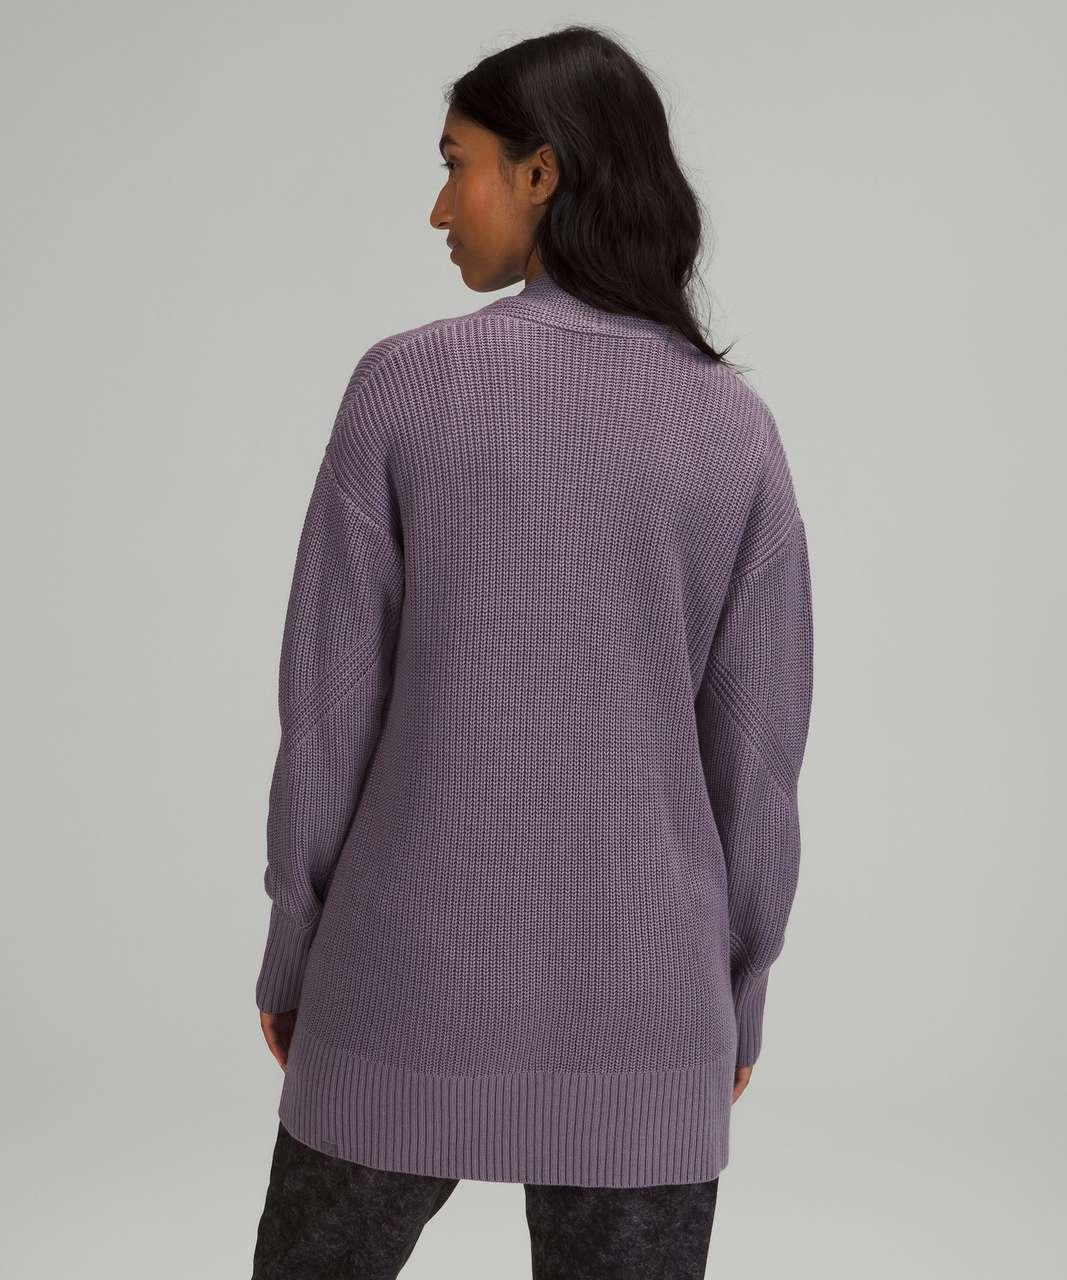 Lululemon Cashlu Sweater Wrap - Dusky Lavender